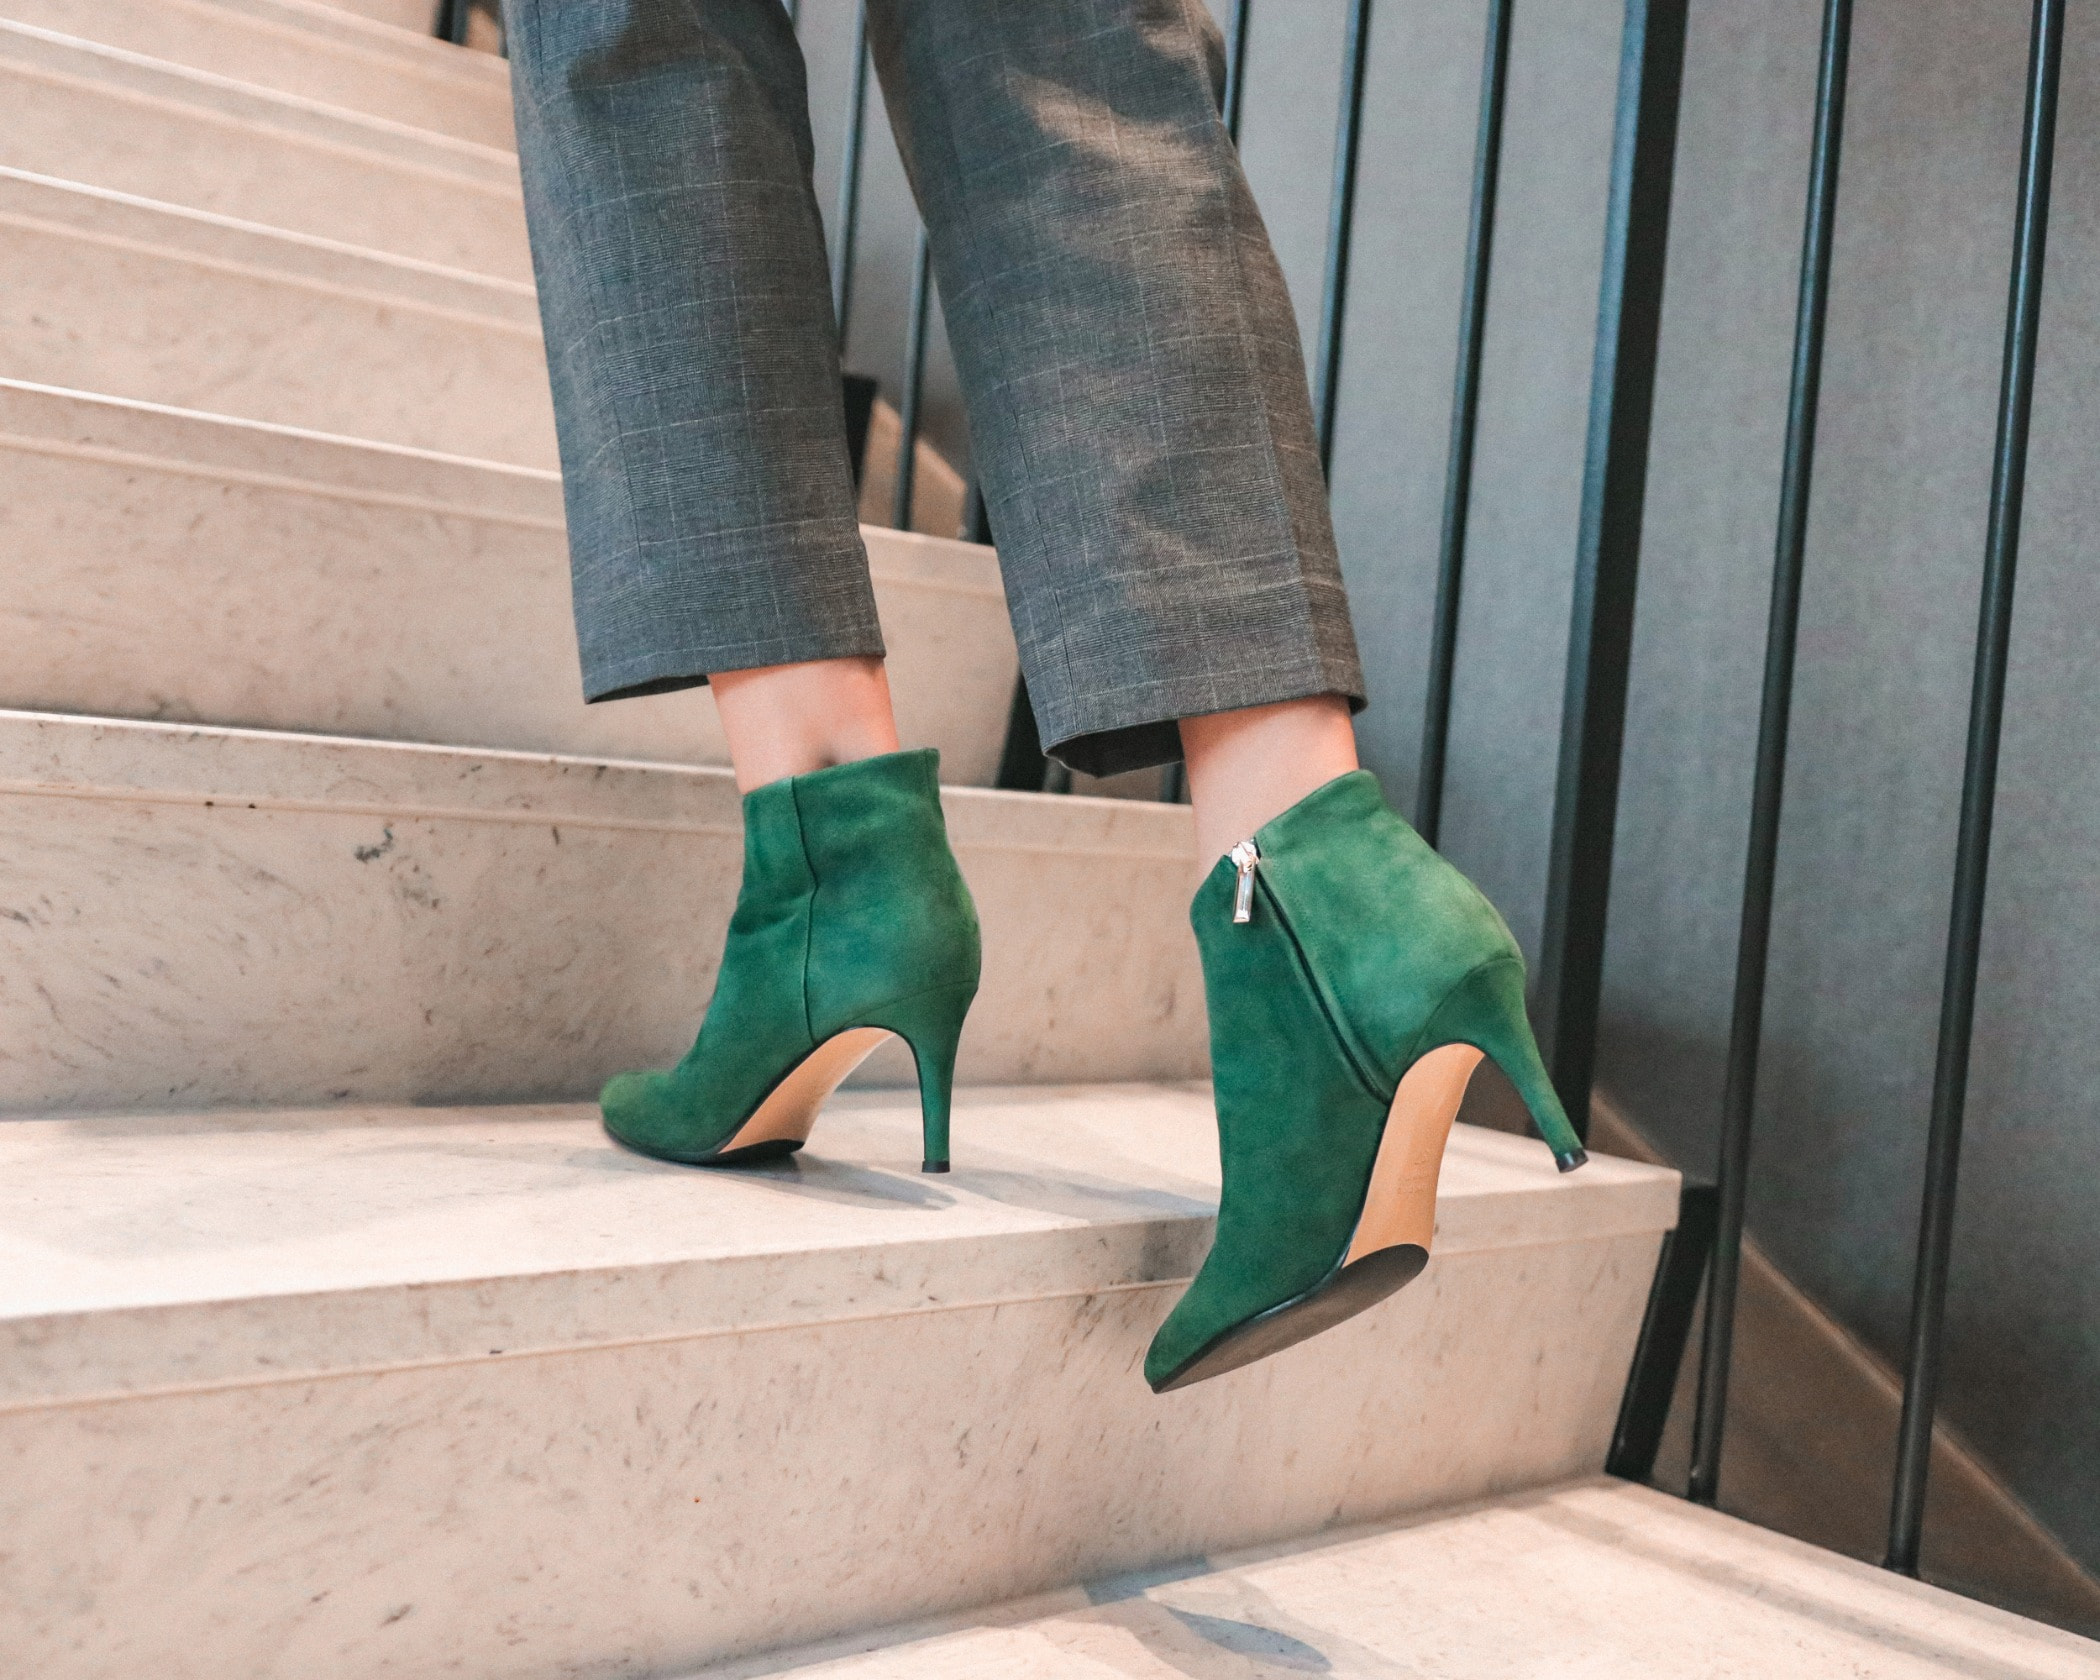 Human leg, Street fashion, Joint, Brown, Jeans, Ankle, Green, Shoe, Footwear